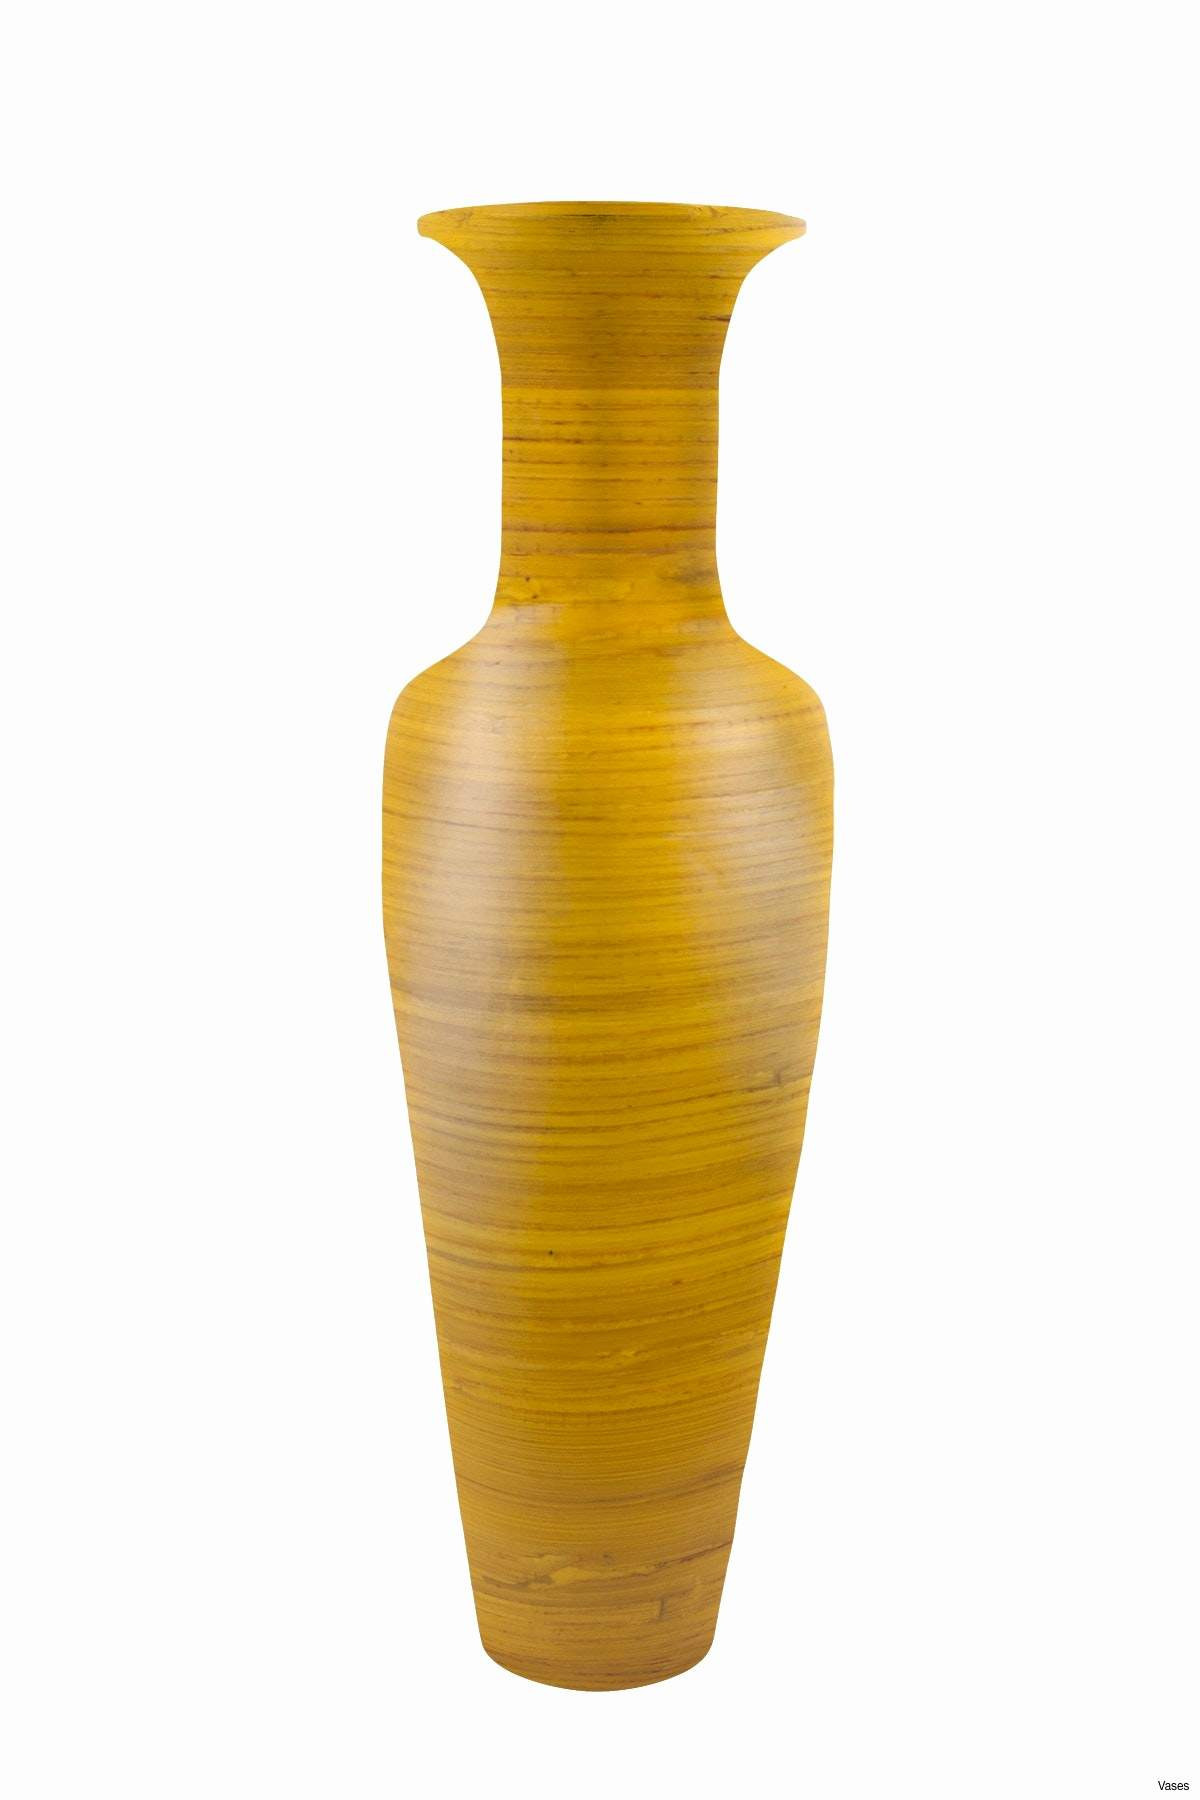 28 Fantastic Steuben Glass Vase 2021 free download steuben glass vase of vase sets of 3 pictures 25 new floor vase set 3 vases artificial intended for vase sets of 3 gallery area floor rugs new joaquin gray vases set 3 2h pottery